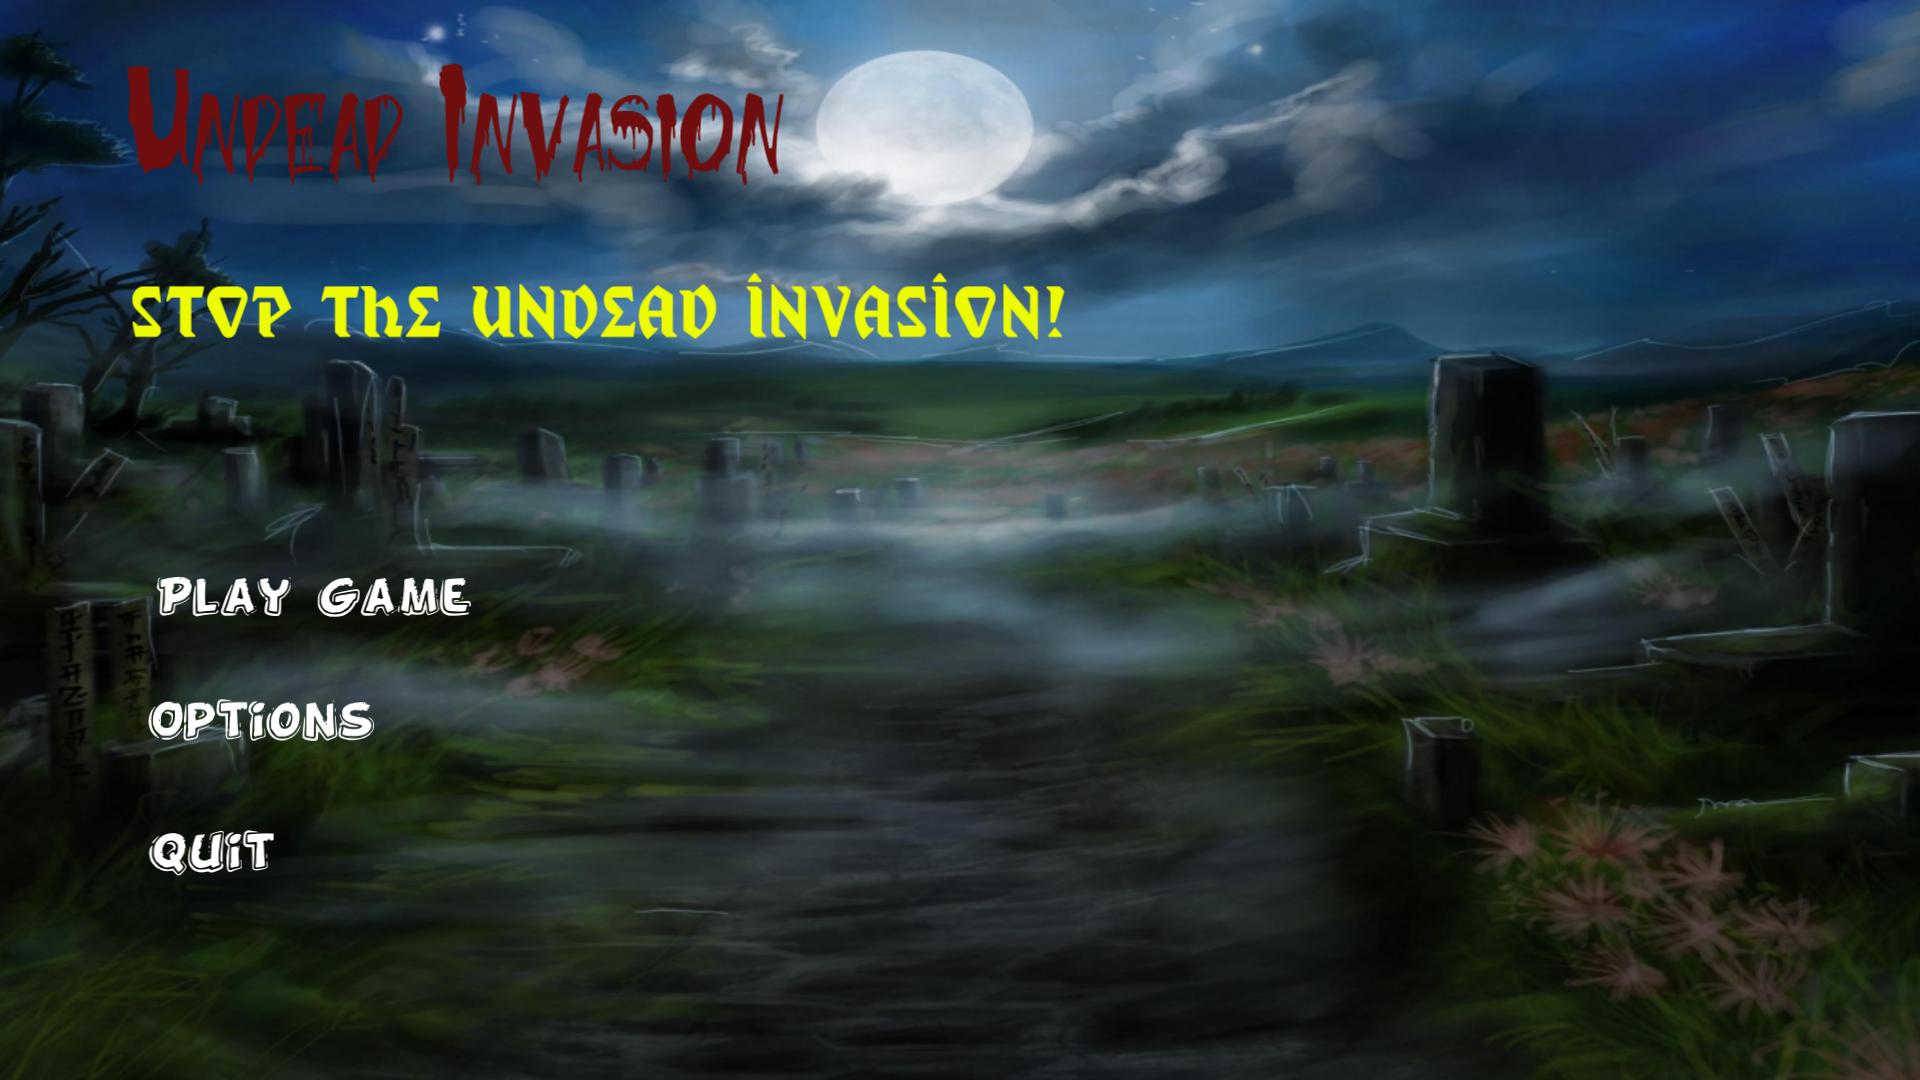 Undead Invasion